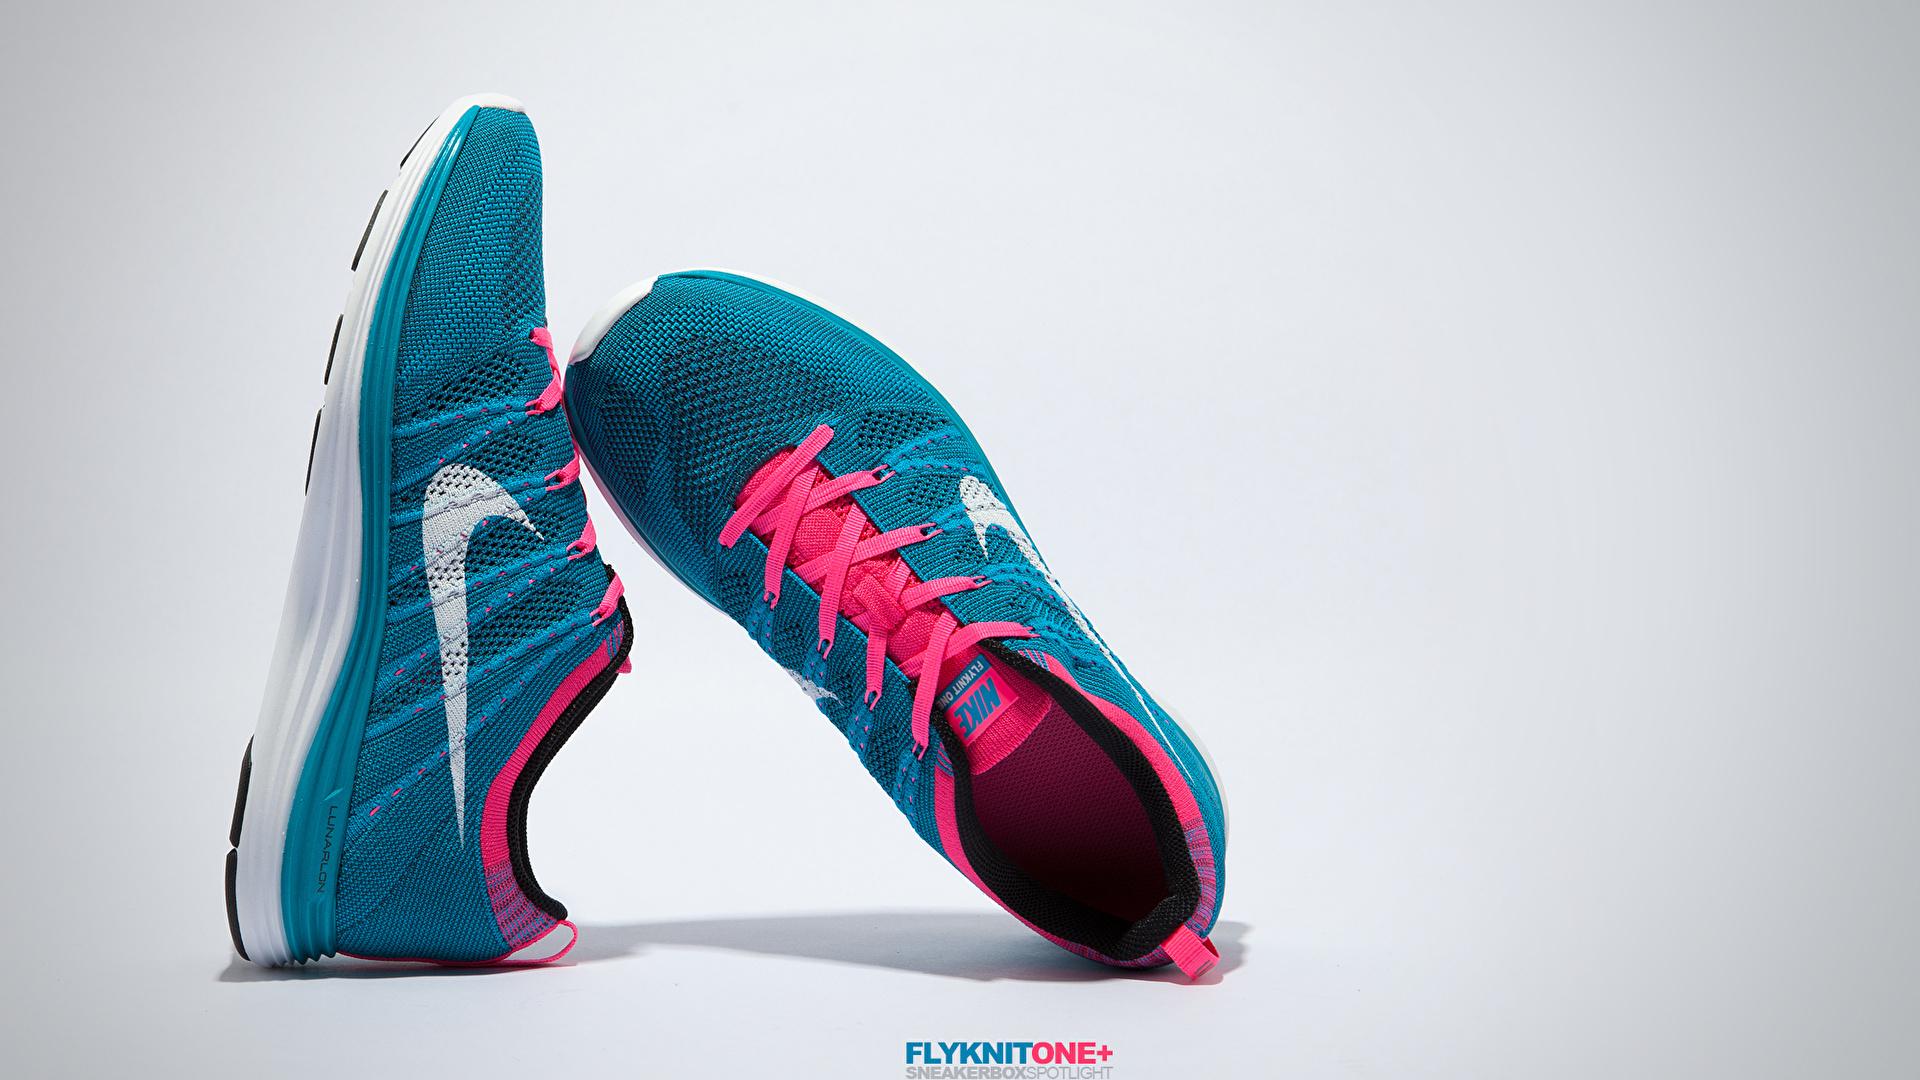 Marca Flyknit Cerca Fondos One Pantalla 1920x1080 Nike De Pwkn0O